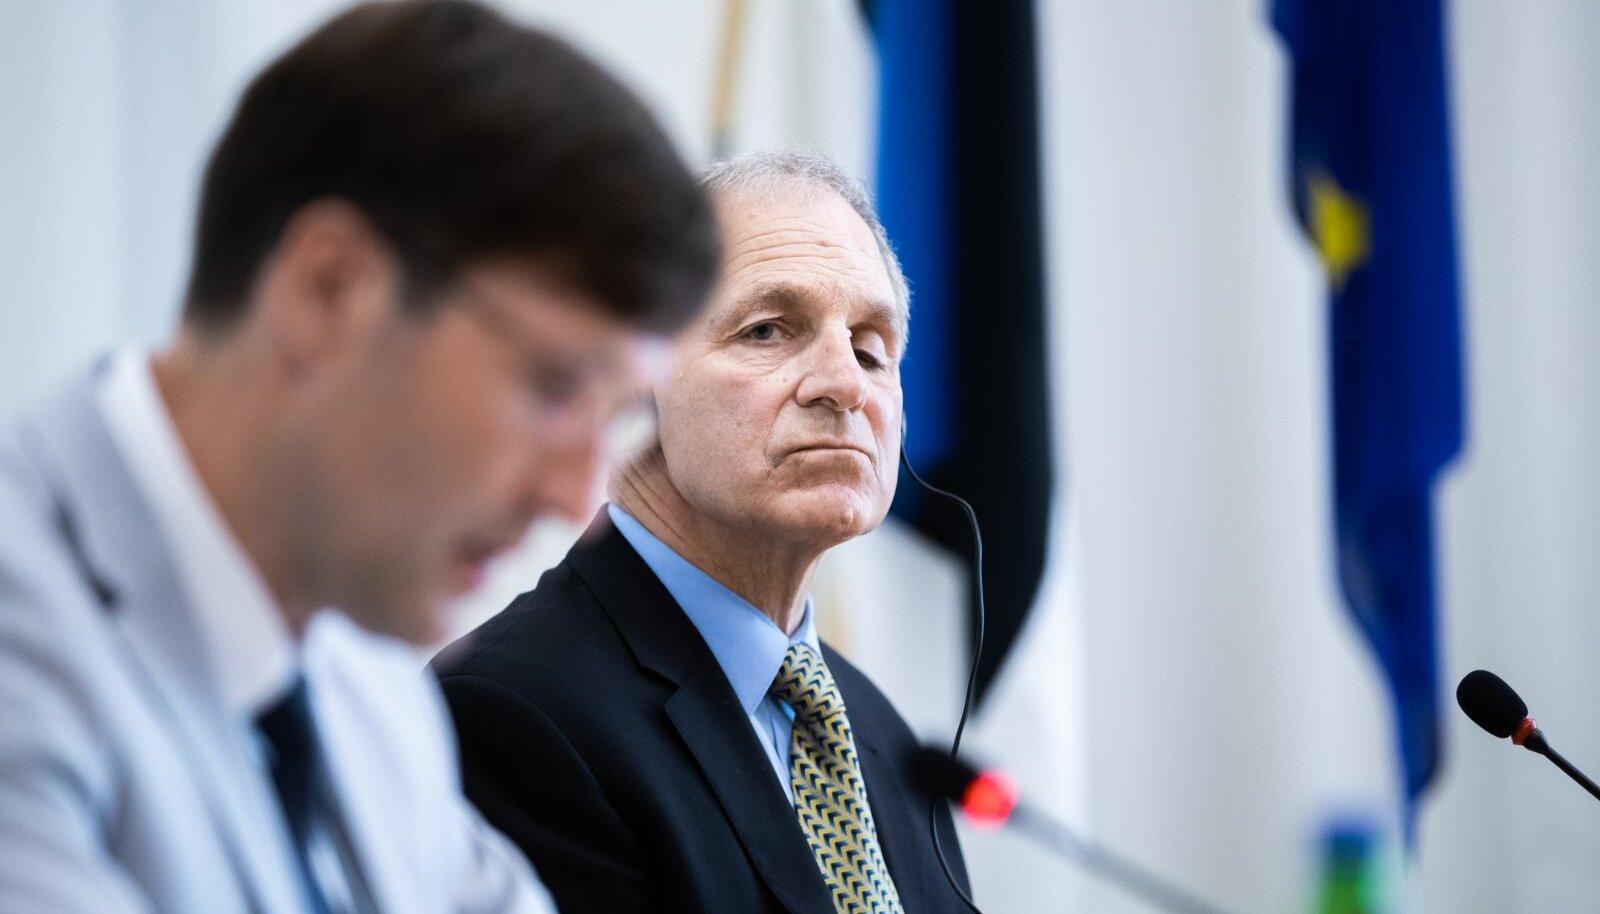 Martin Helme ja advokaadibüroo Freeh Sporkin & Sullivan LLP juht ja asutaja Louis Freeh 'i pressikonverentsEsiplaanil Martin Helme, tagaplaanil USA advokaat Louis Freeh.